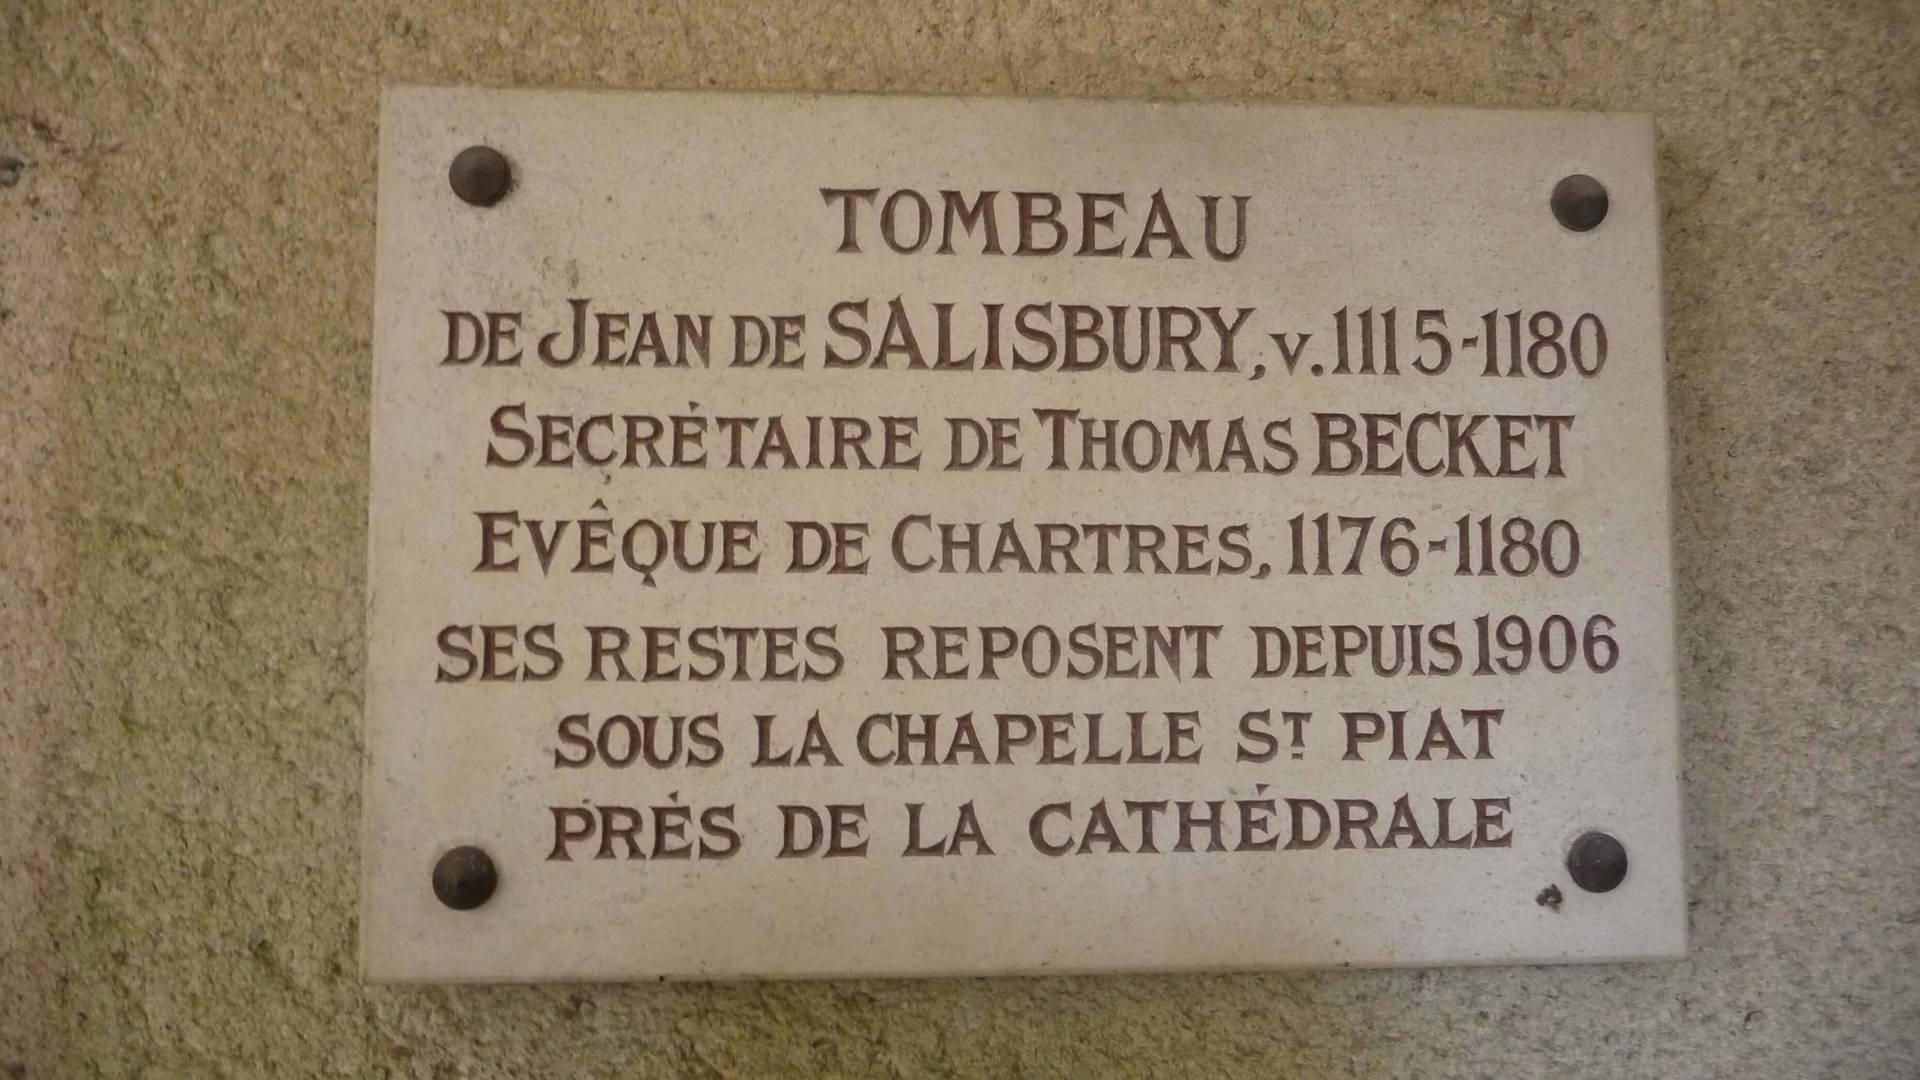 Tombeau de Jean de Salisbury